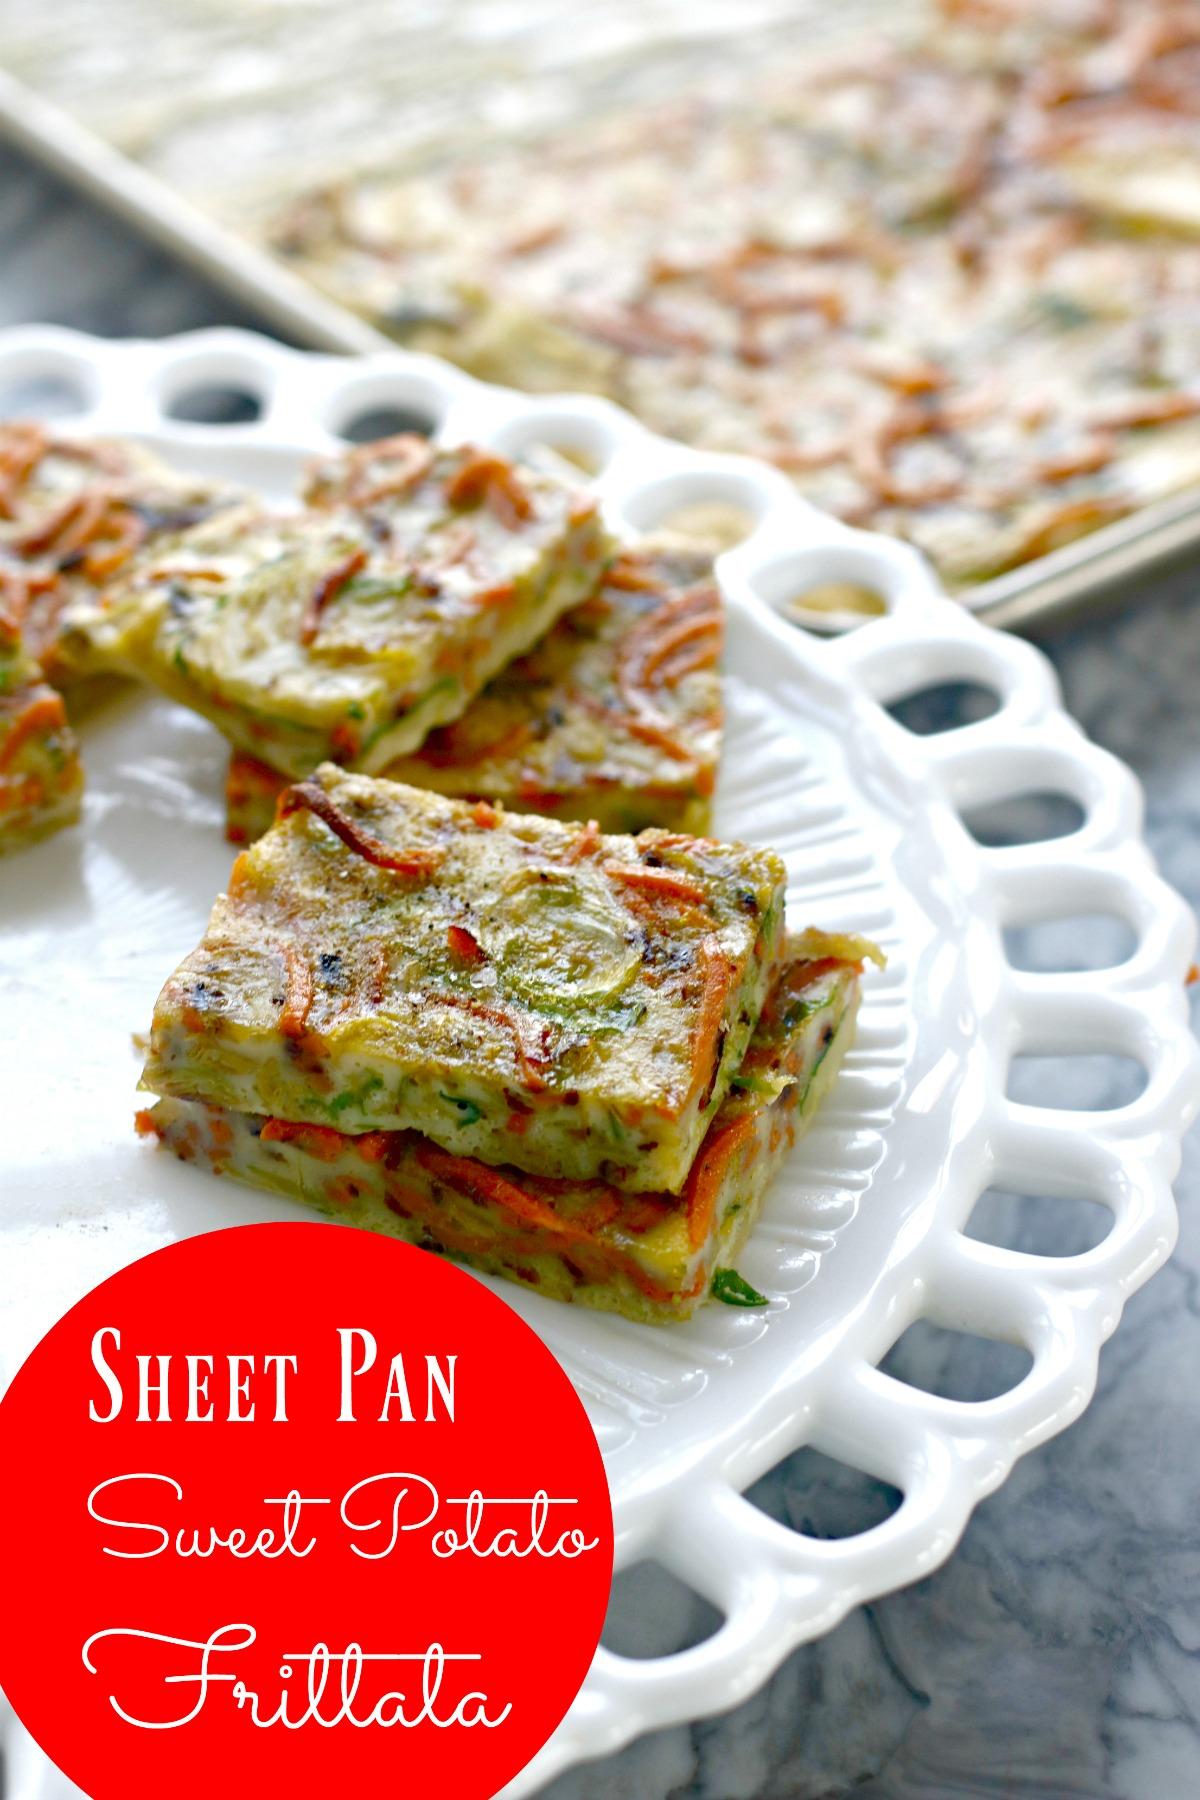 Vegetarian Frittata Recipe: A Sheetpan Frittata from Spinach TIger